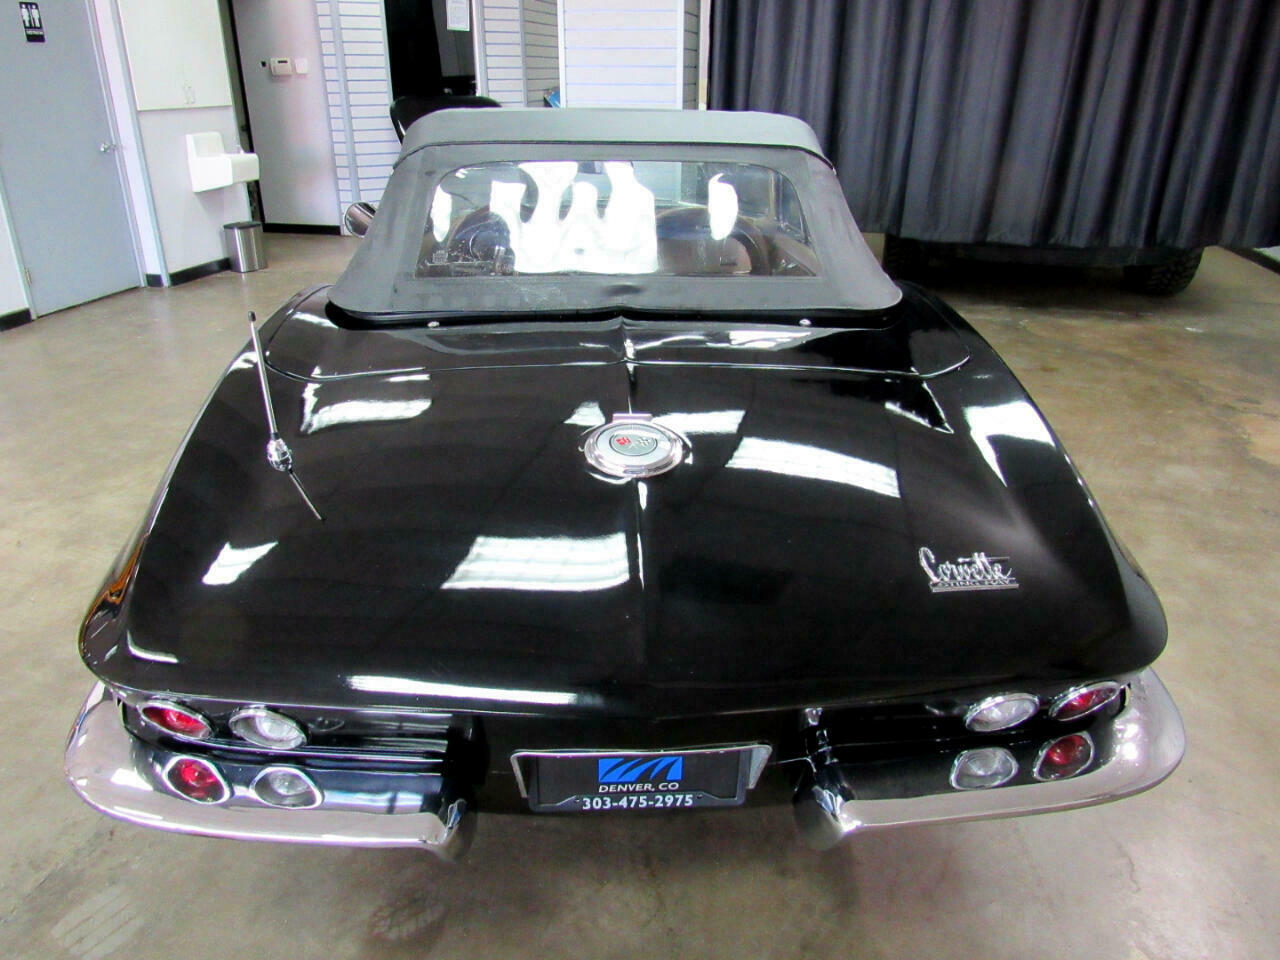 1966 Black Chevrolet Corvette Convertible  | C2 Corvette Photo 6